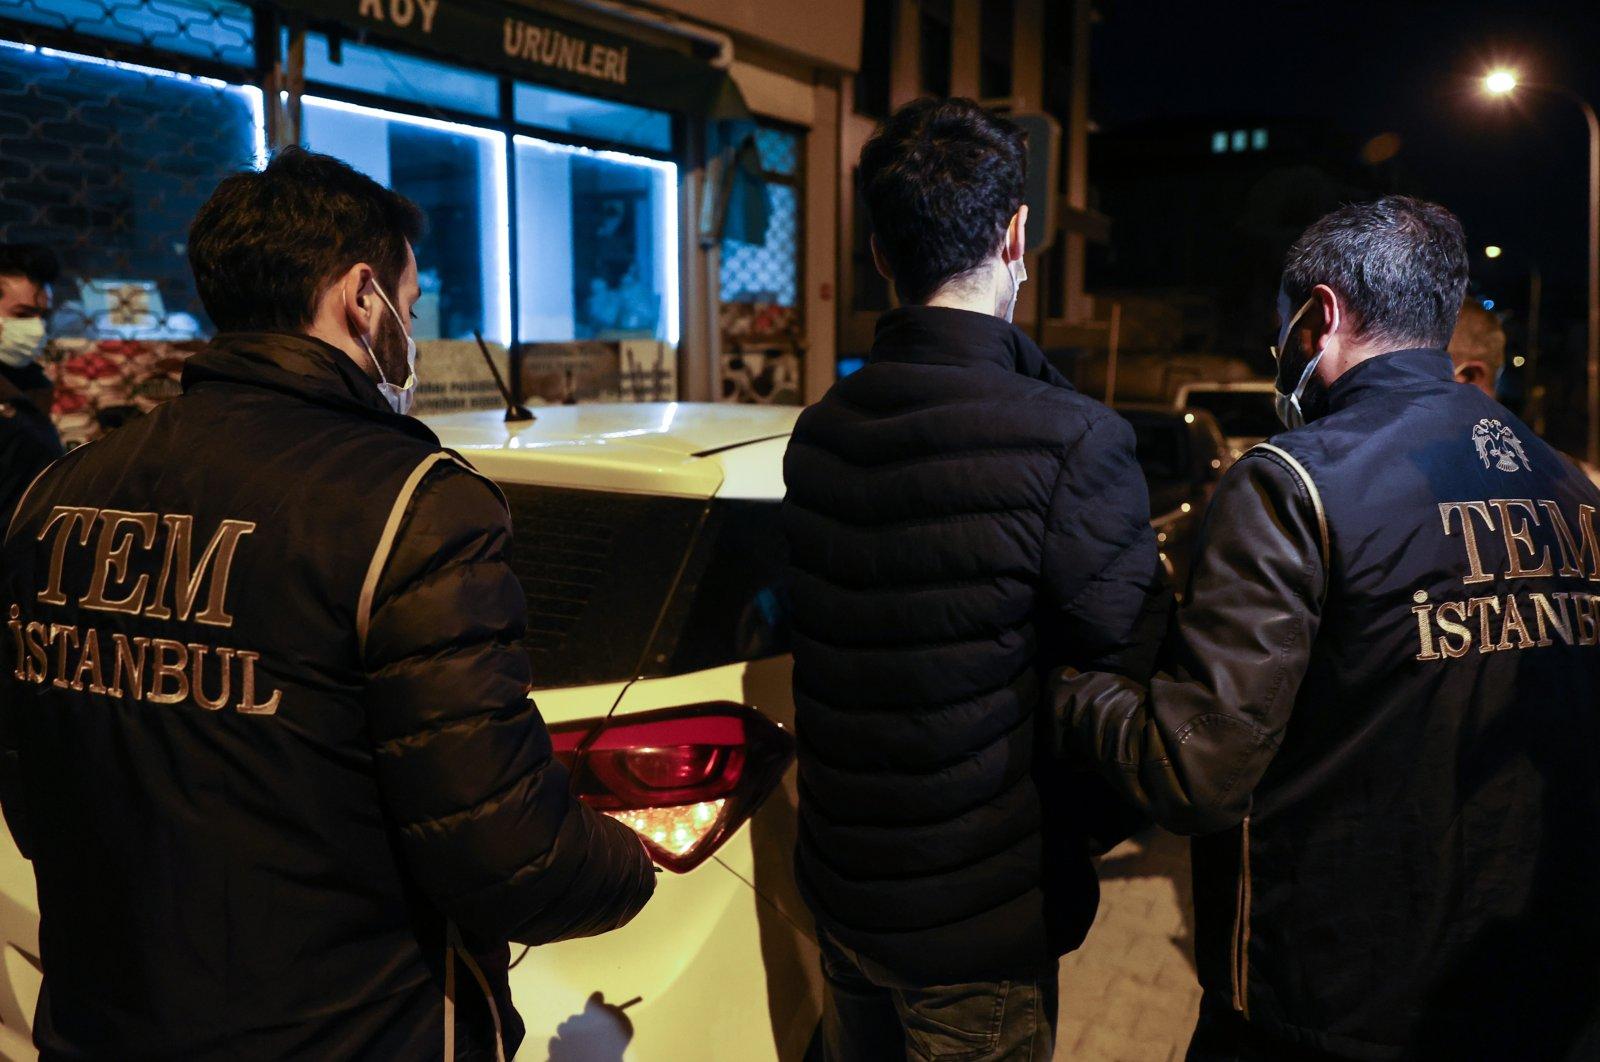 Police escort a suspect captured in Istanbul, Turkey, Mar. 30, 2021. (AA PHOTO)